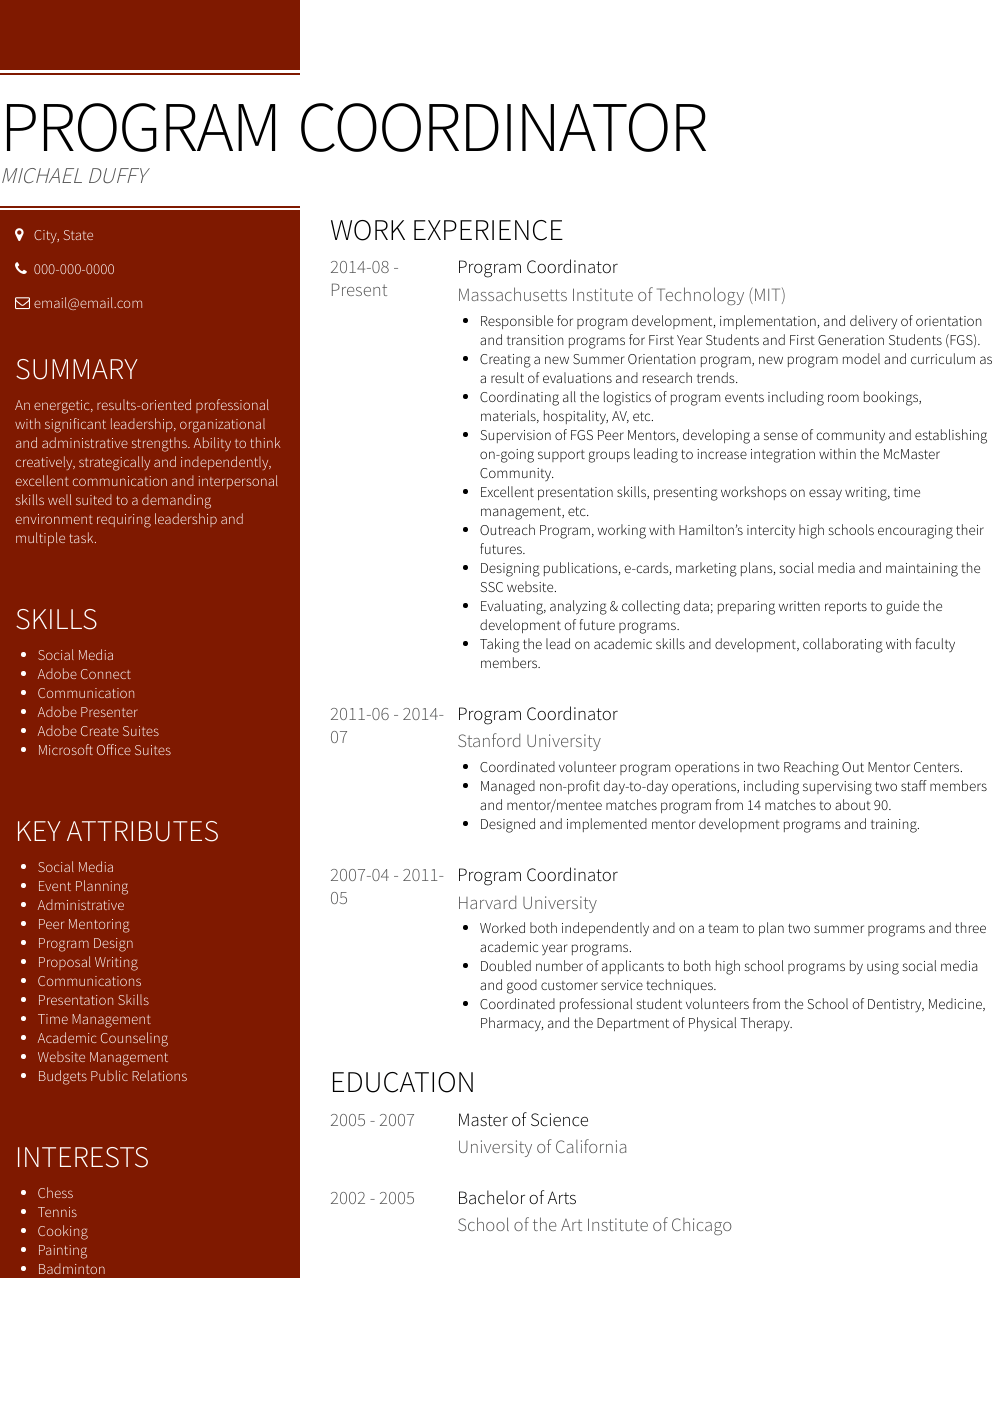 Program Coordinator Resume Sample and Template